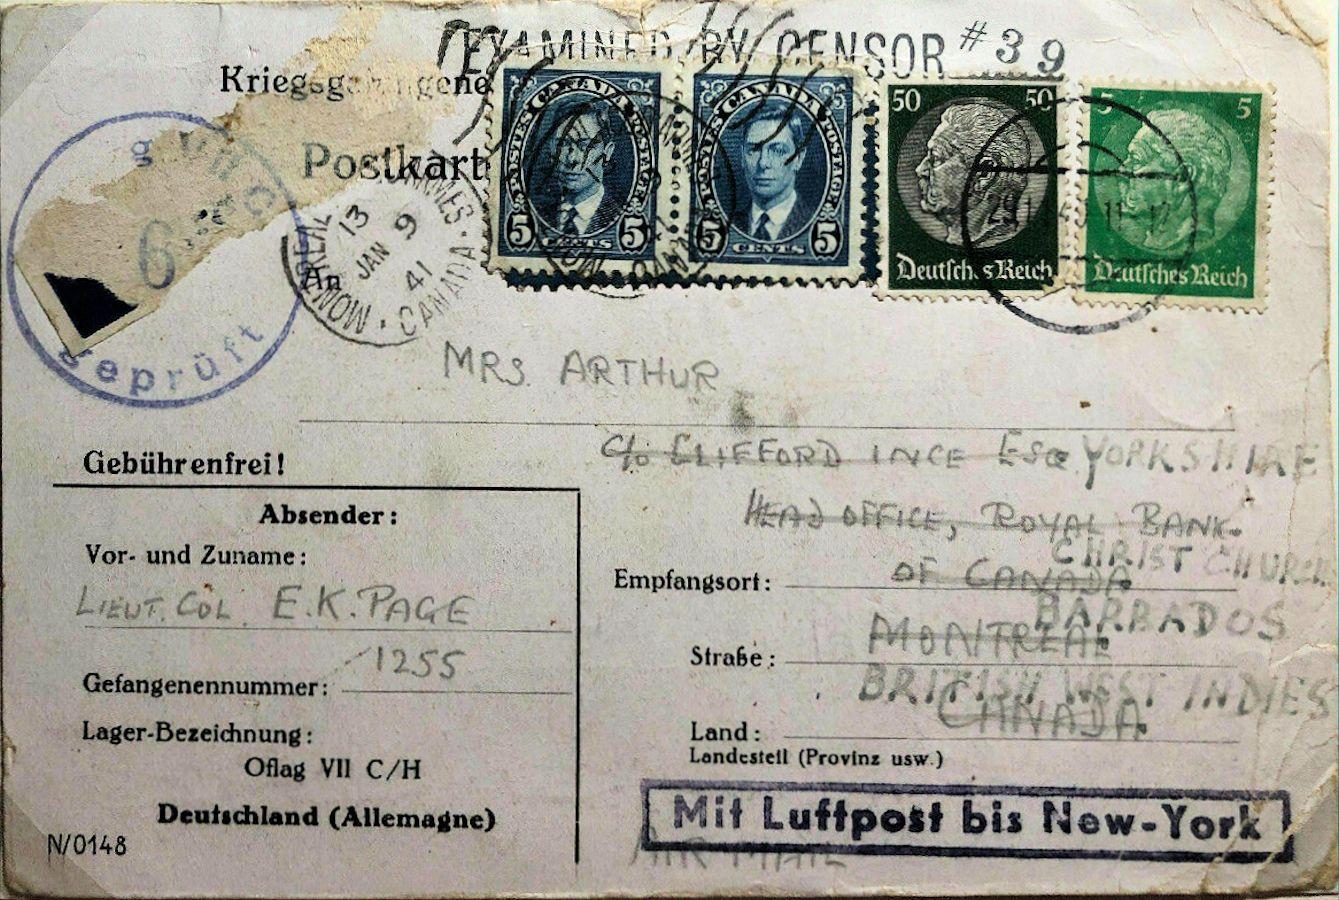 1940;Germany;Oflag VIIC/H ; WW II-Era Christmas POW Card